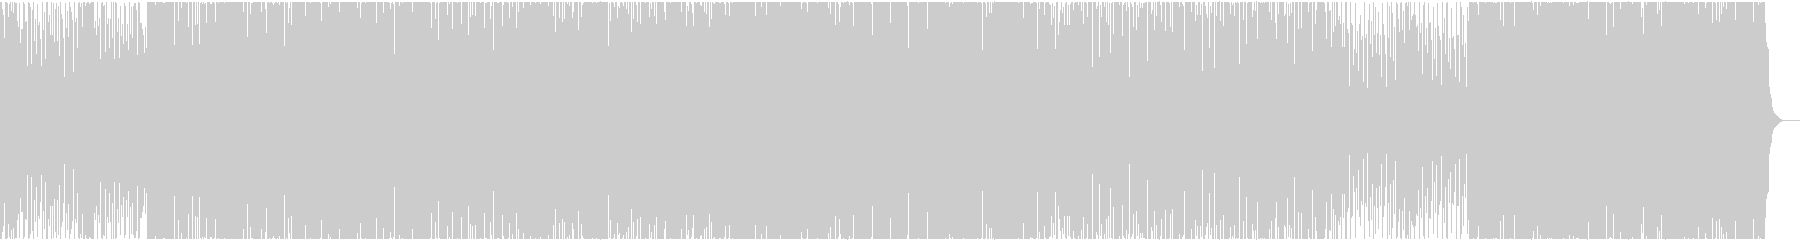 News4 16bit48kHzVerの未再生の波形